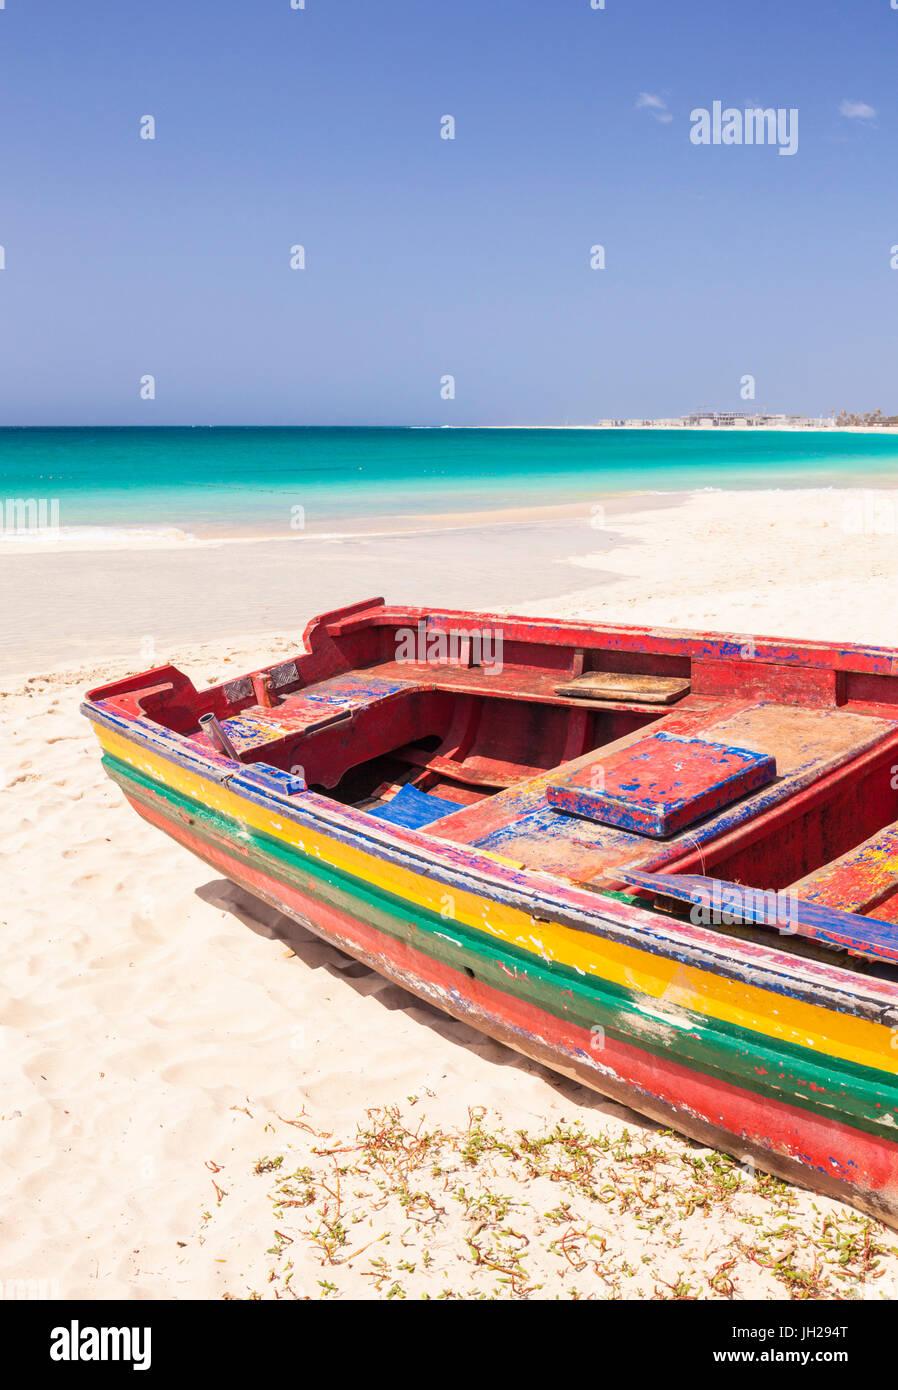 Bunten traditionellen lokalen Fischerboot am Strand von Praia da Santa Maria, Santa Maria, Insel Sal, Kap Verde, Stockbild